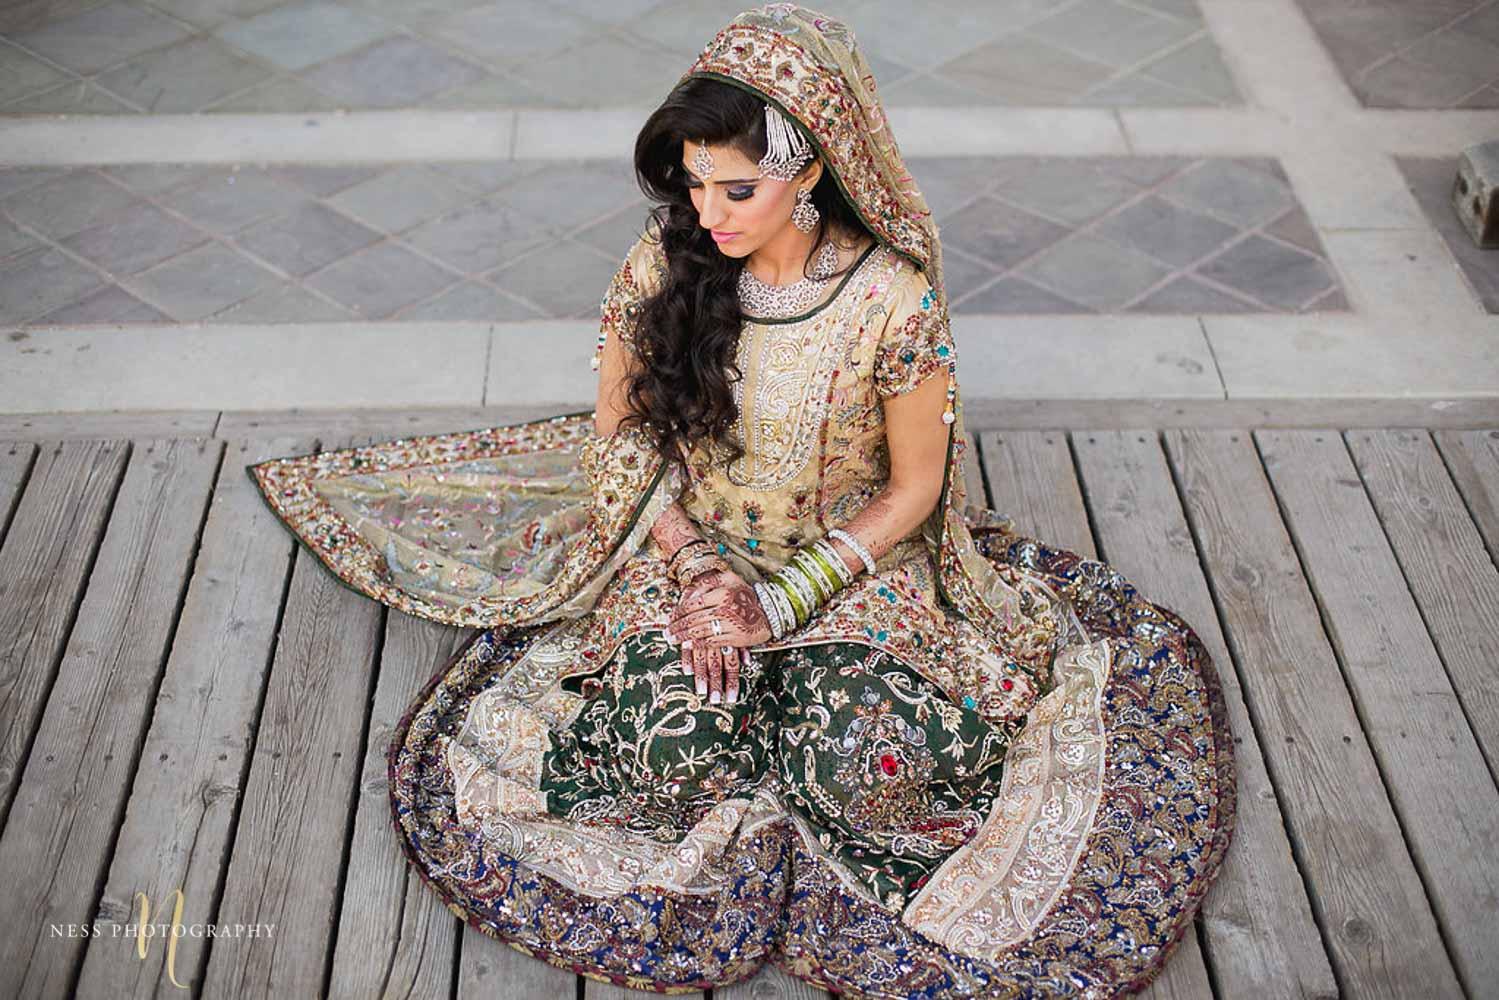 pakistani bride in green lehenga sitting with hands crosses at kariya park and looking down